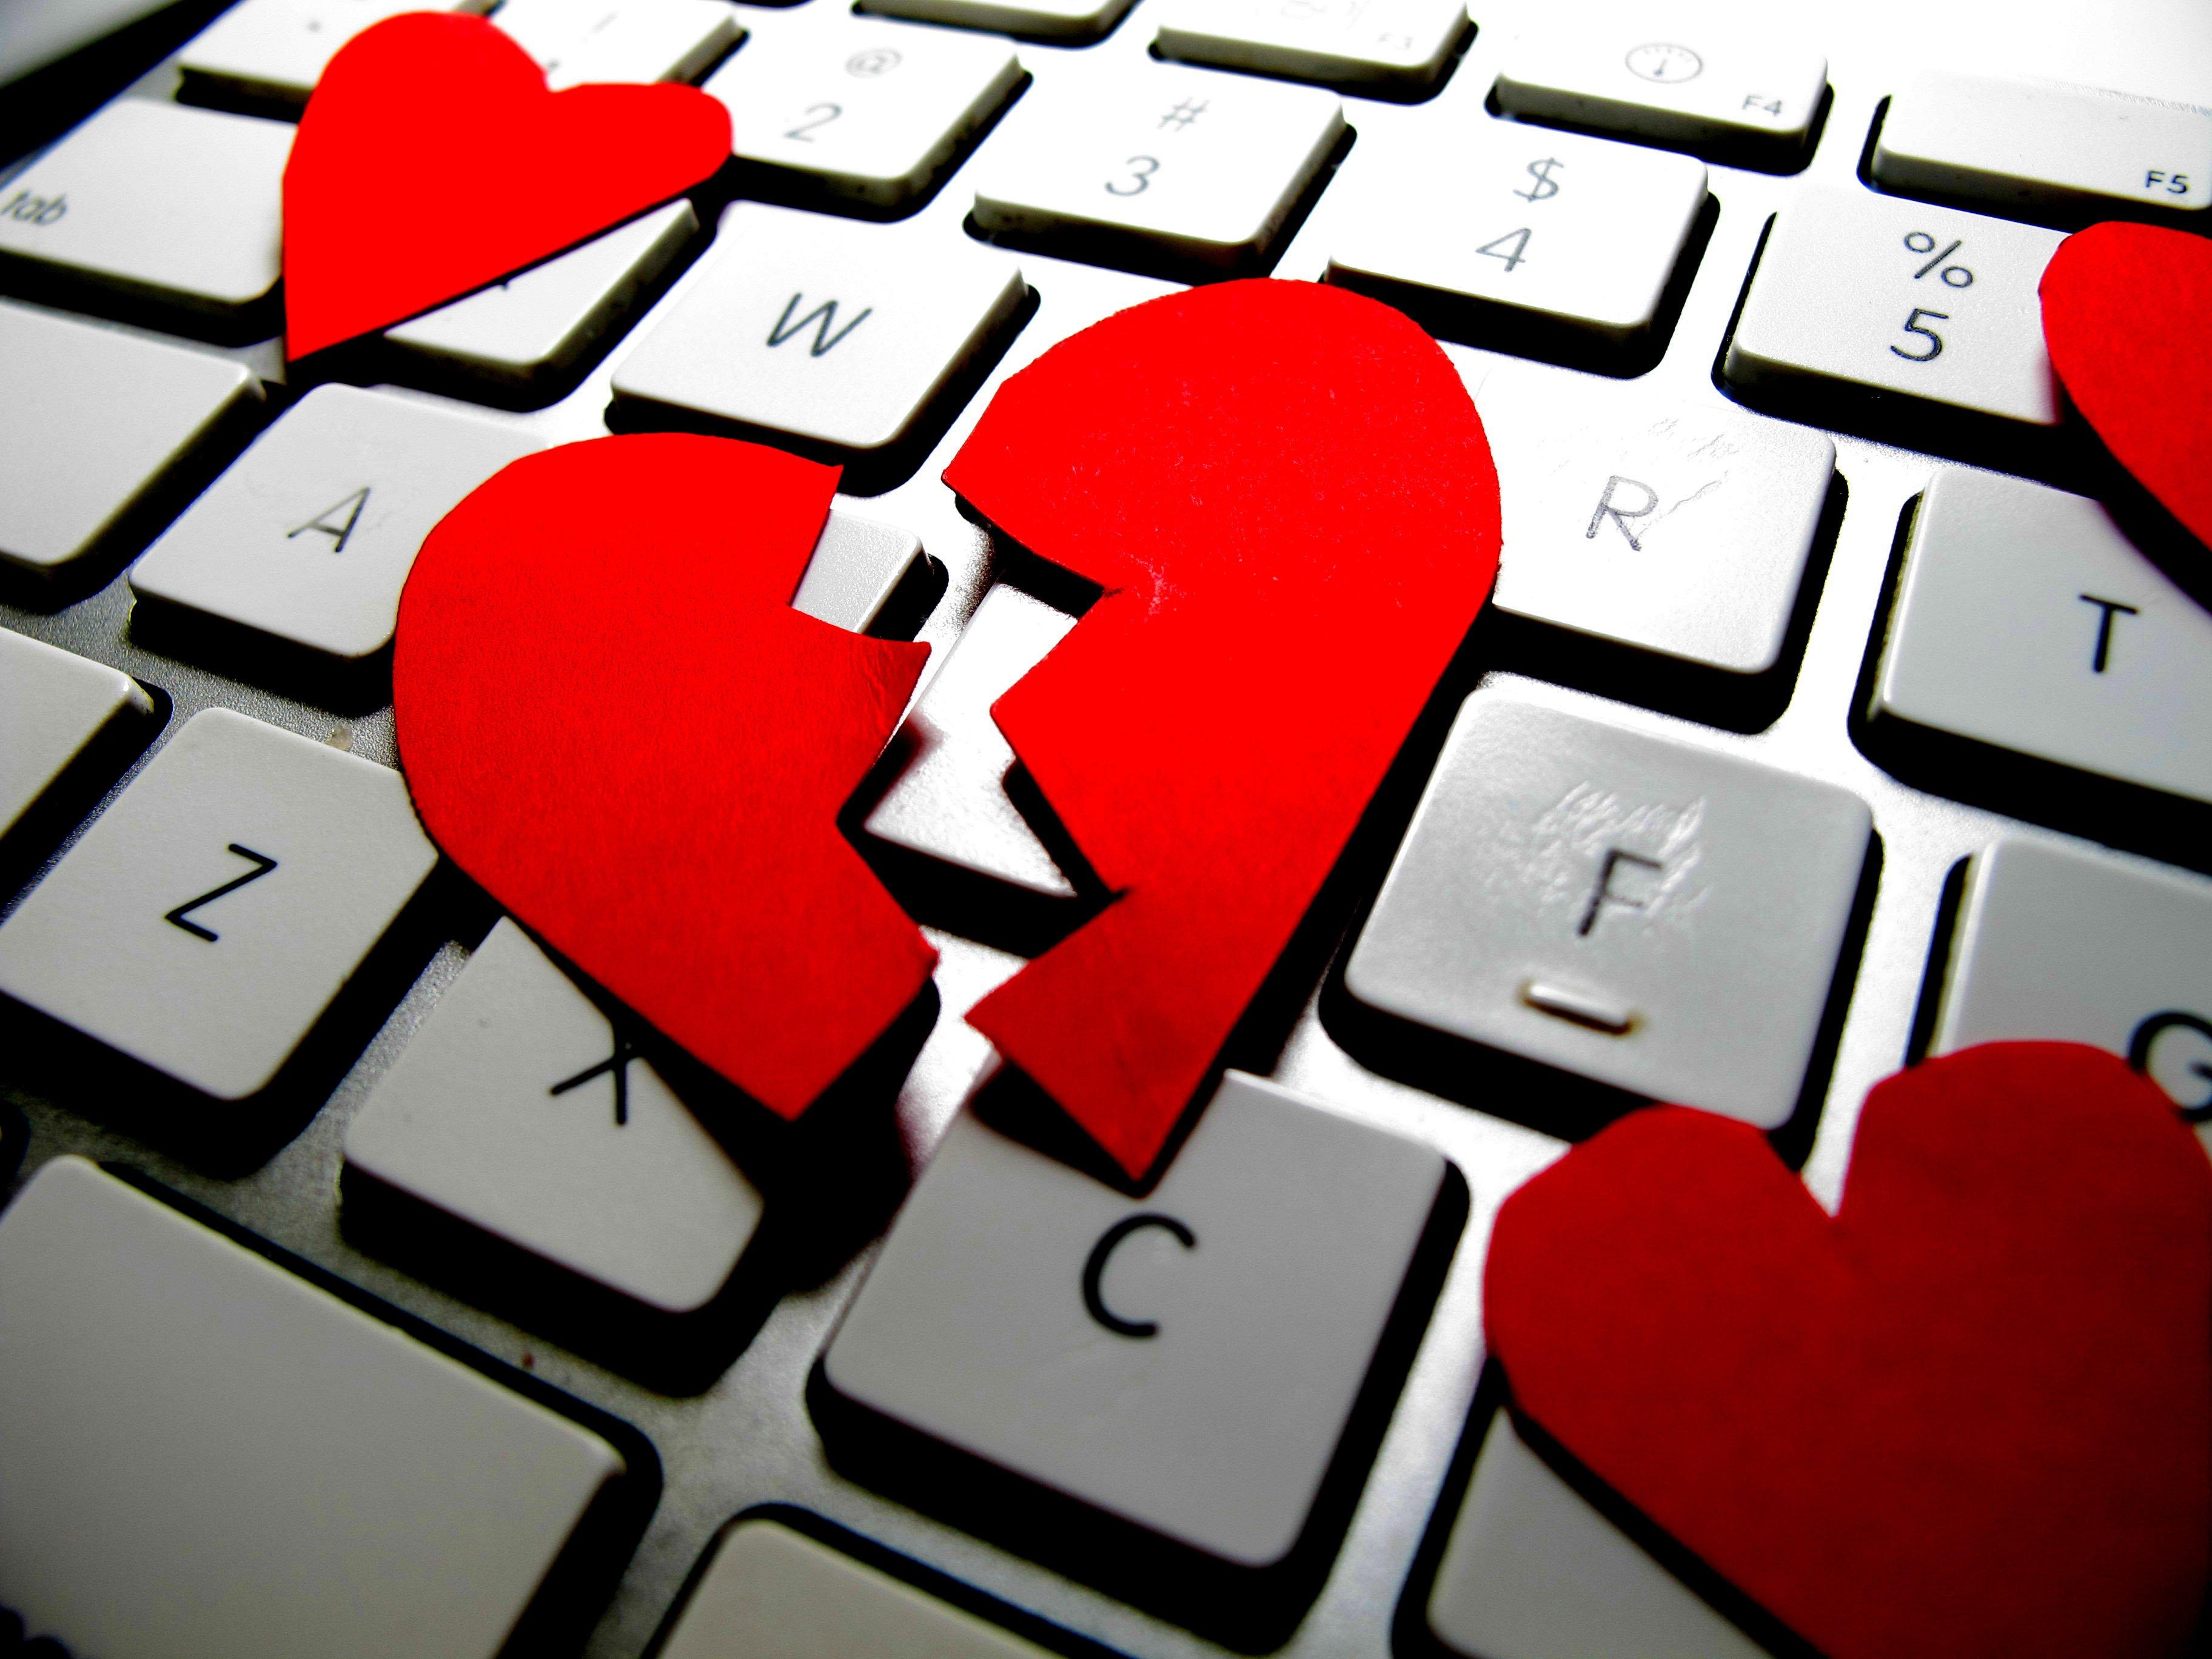 Broken hearts on keyboard